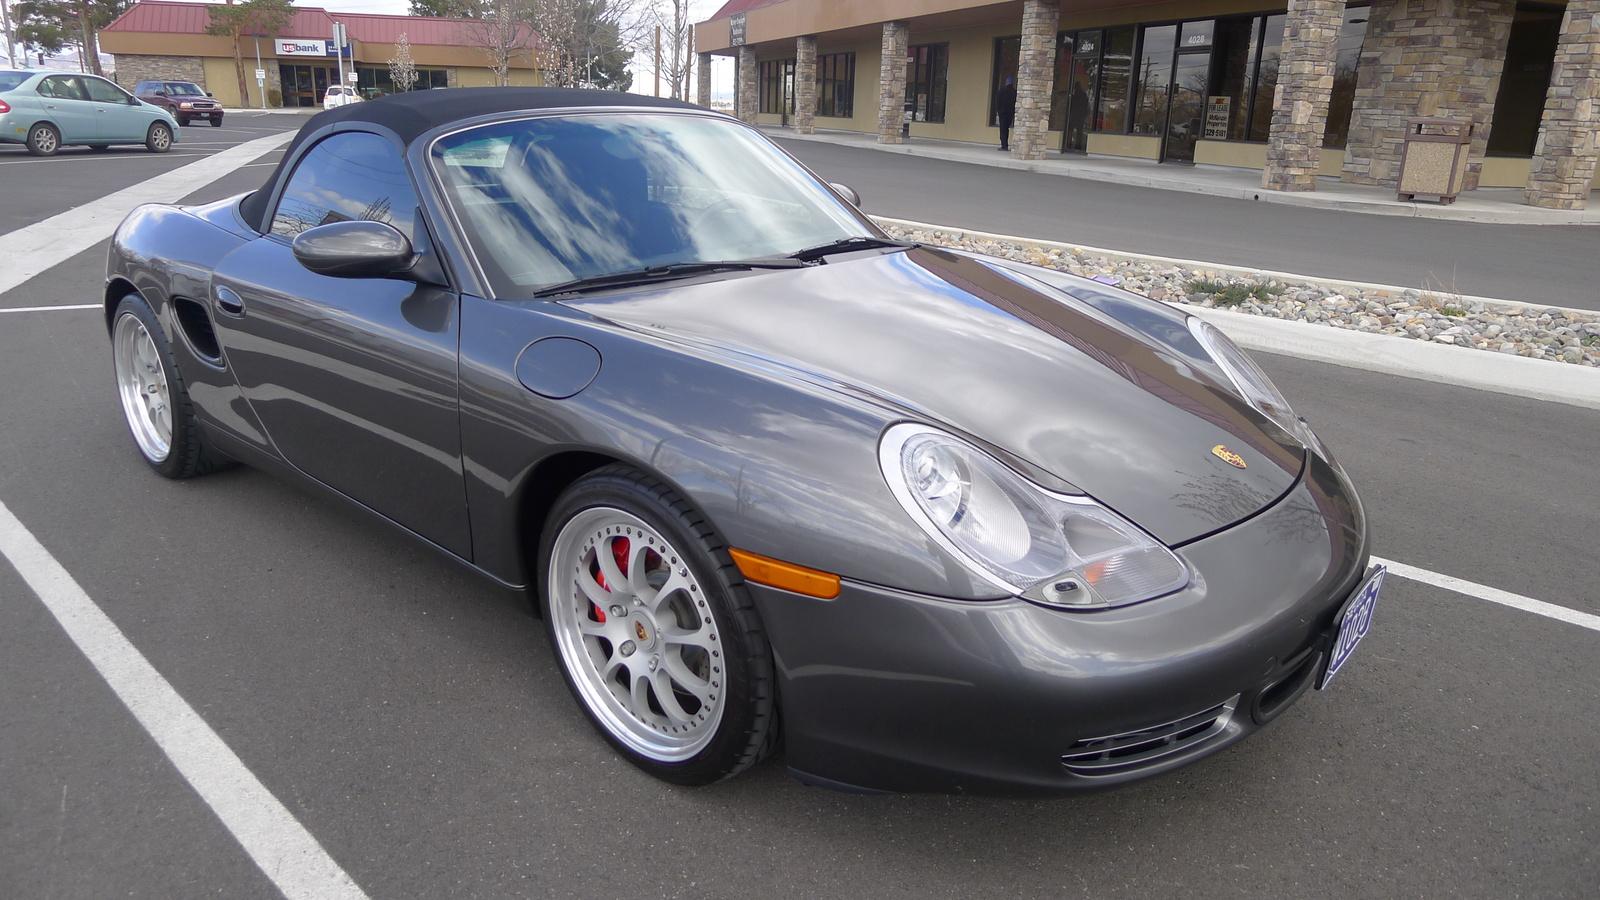 2002 Porsche Boxster - Pictures - CarGurus